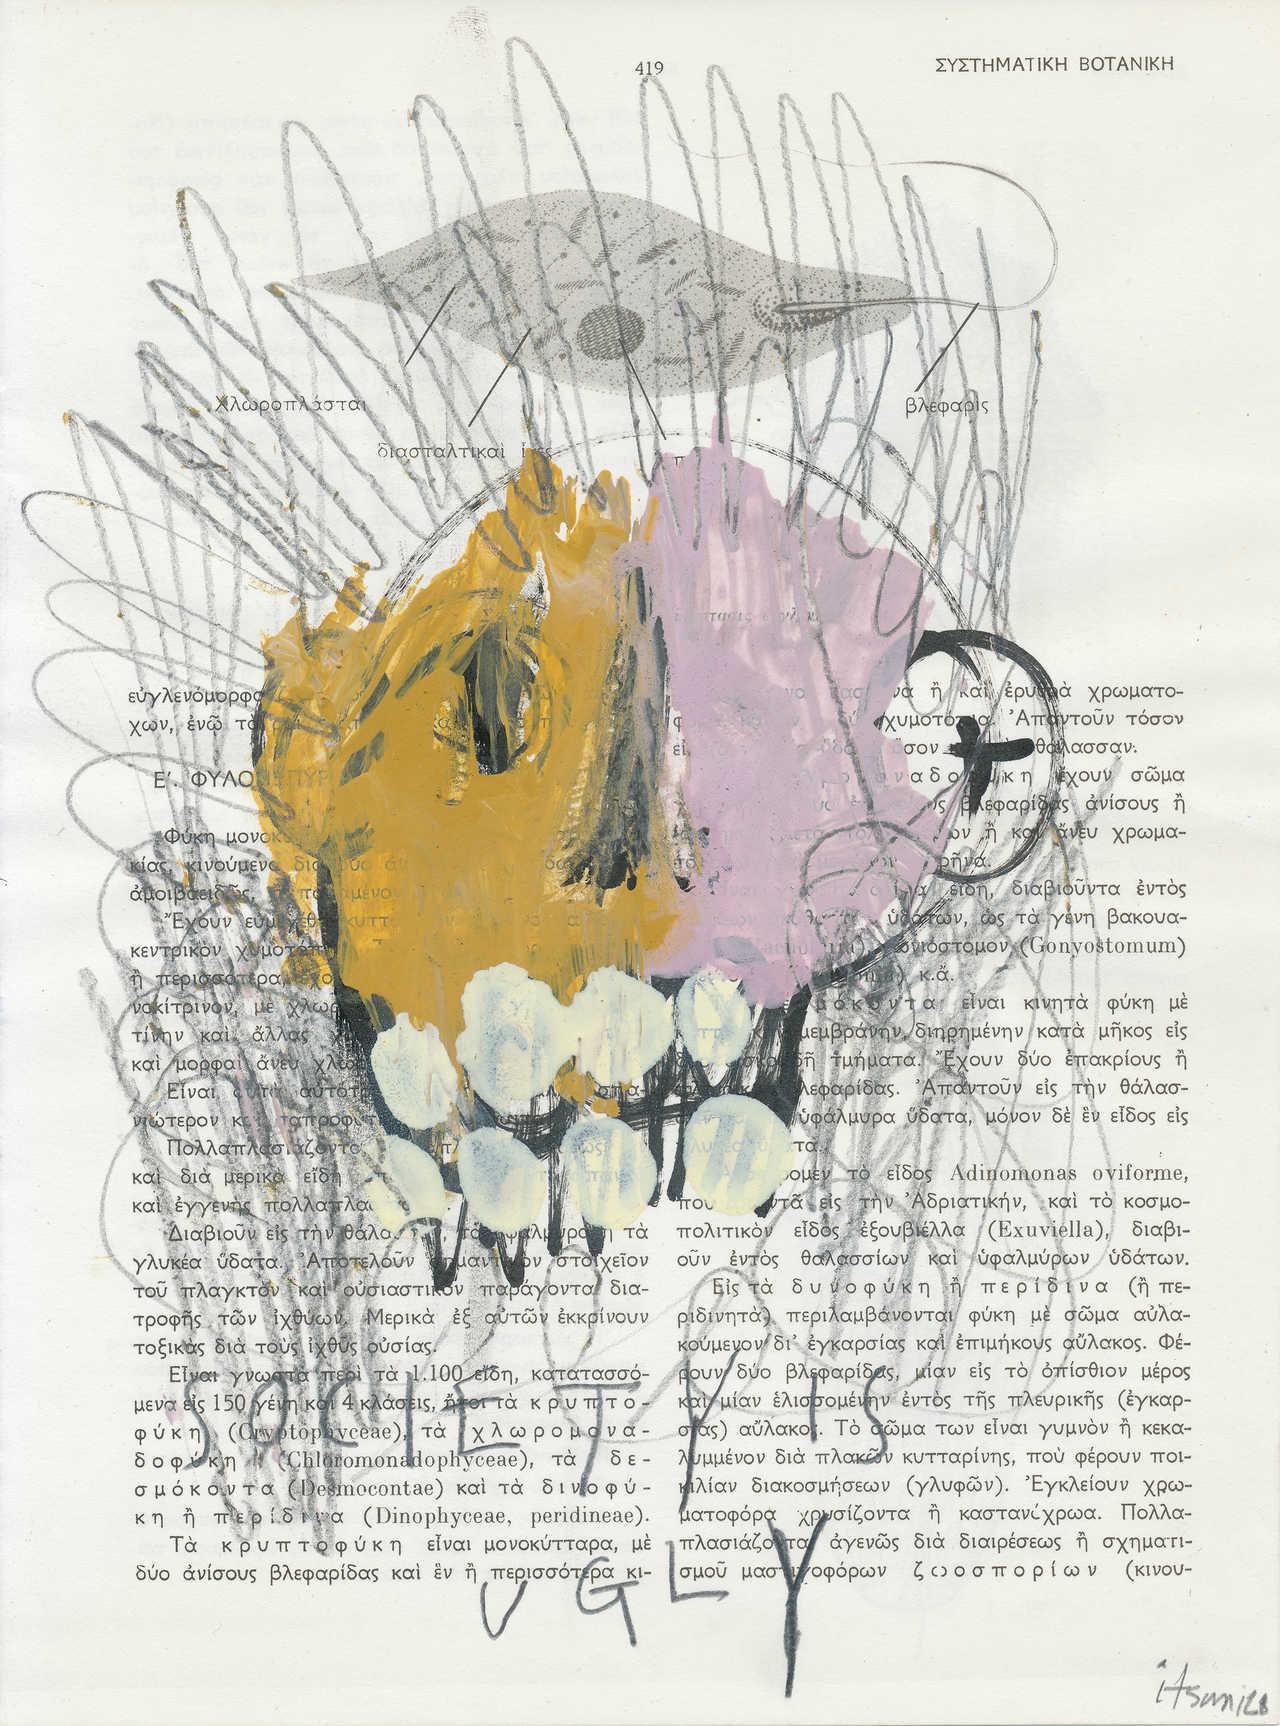 Society is ugly, 2020, ακρυλικό, spray, μαρκαδόρος και μολύβι σε σελίδα βιβλίου Βοτανικής, 28Χ20,5 εκ.